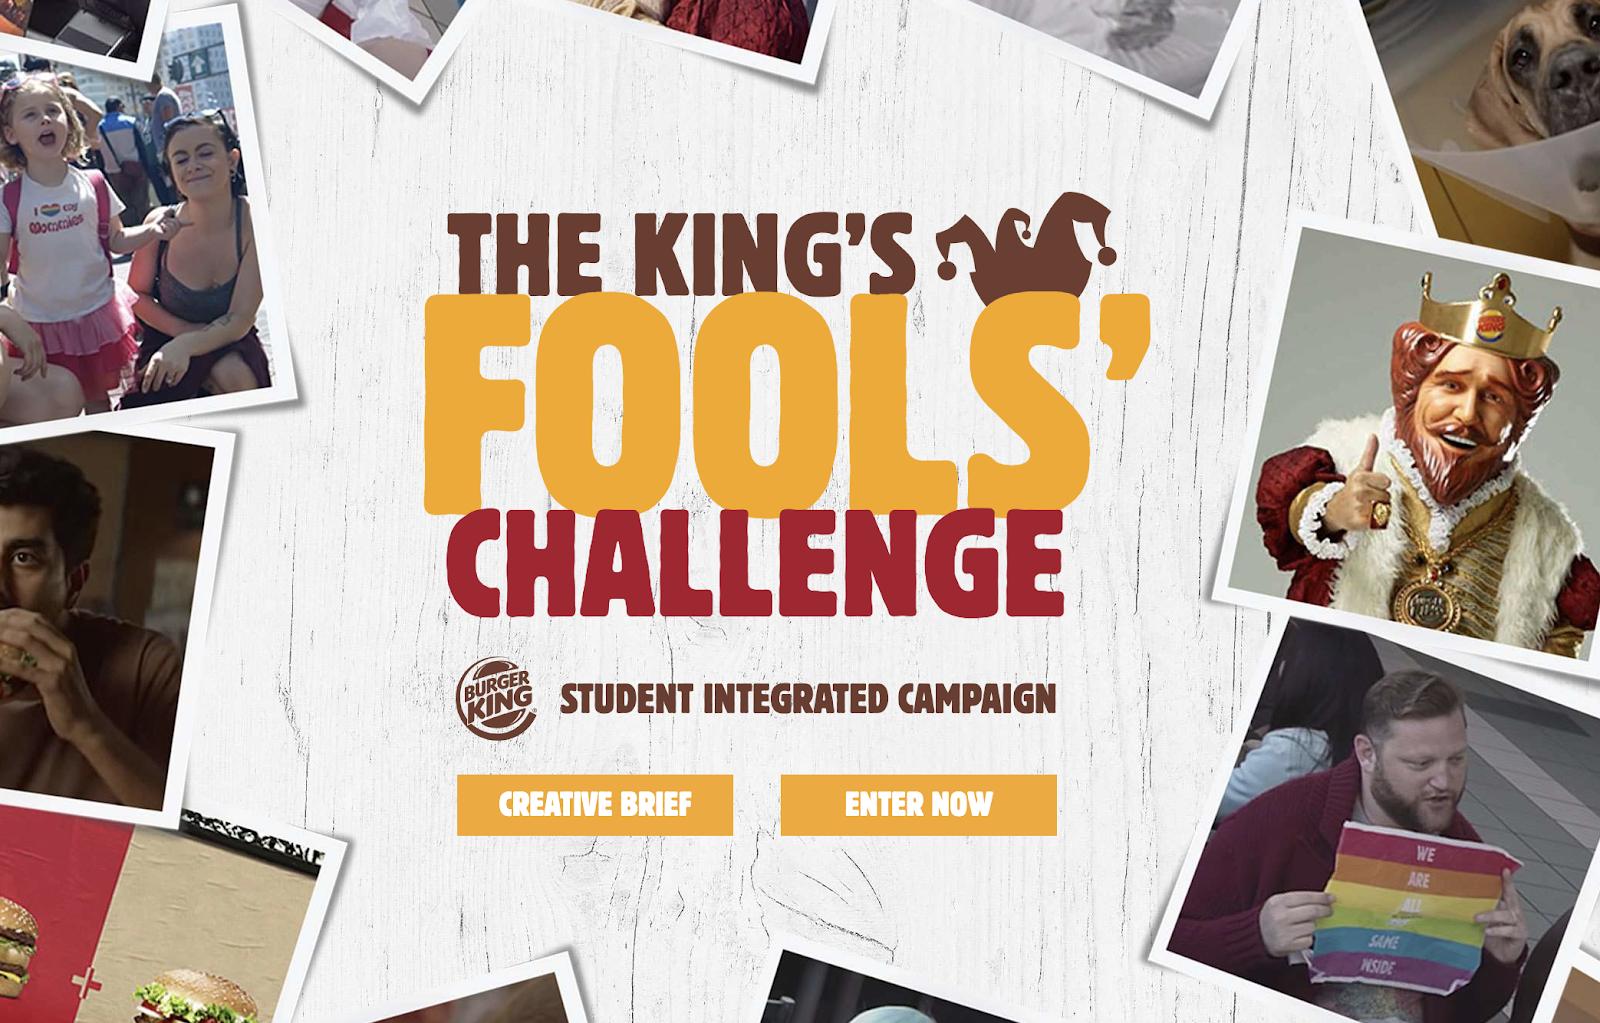 Burger King: The King's Fool's Challenge